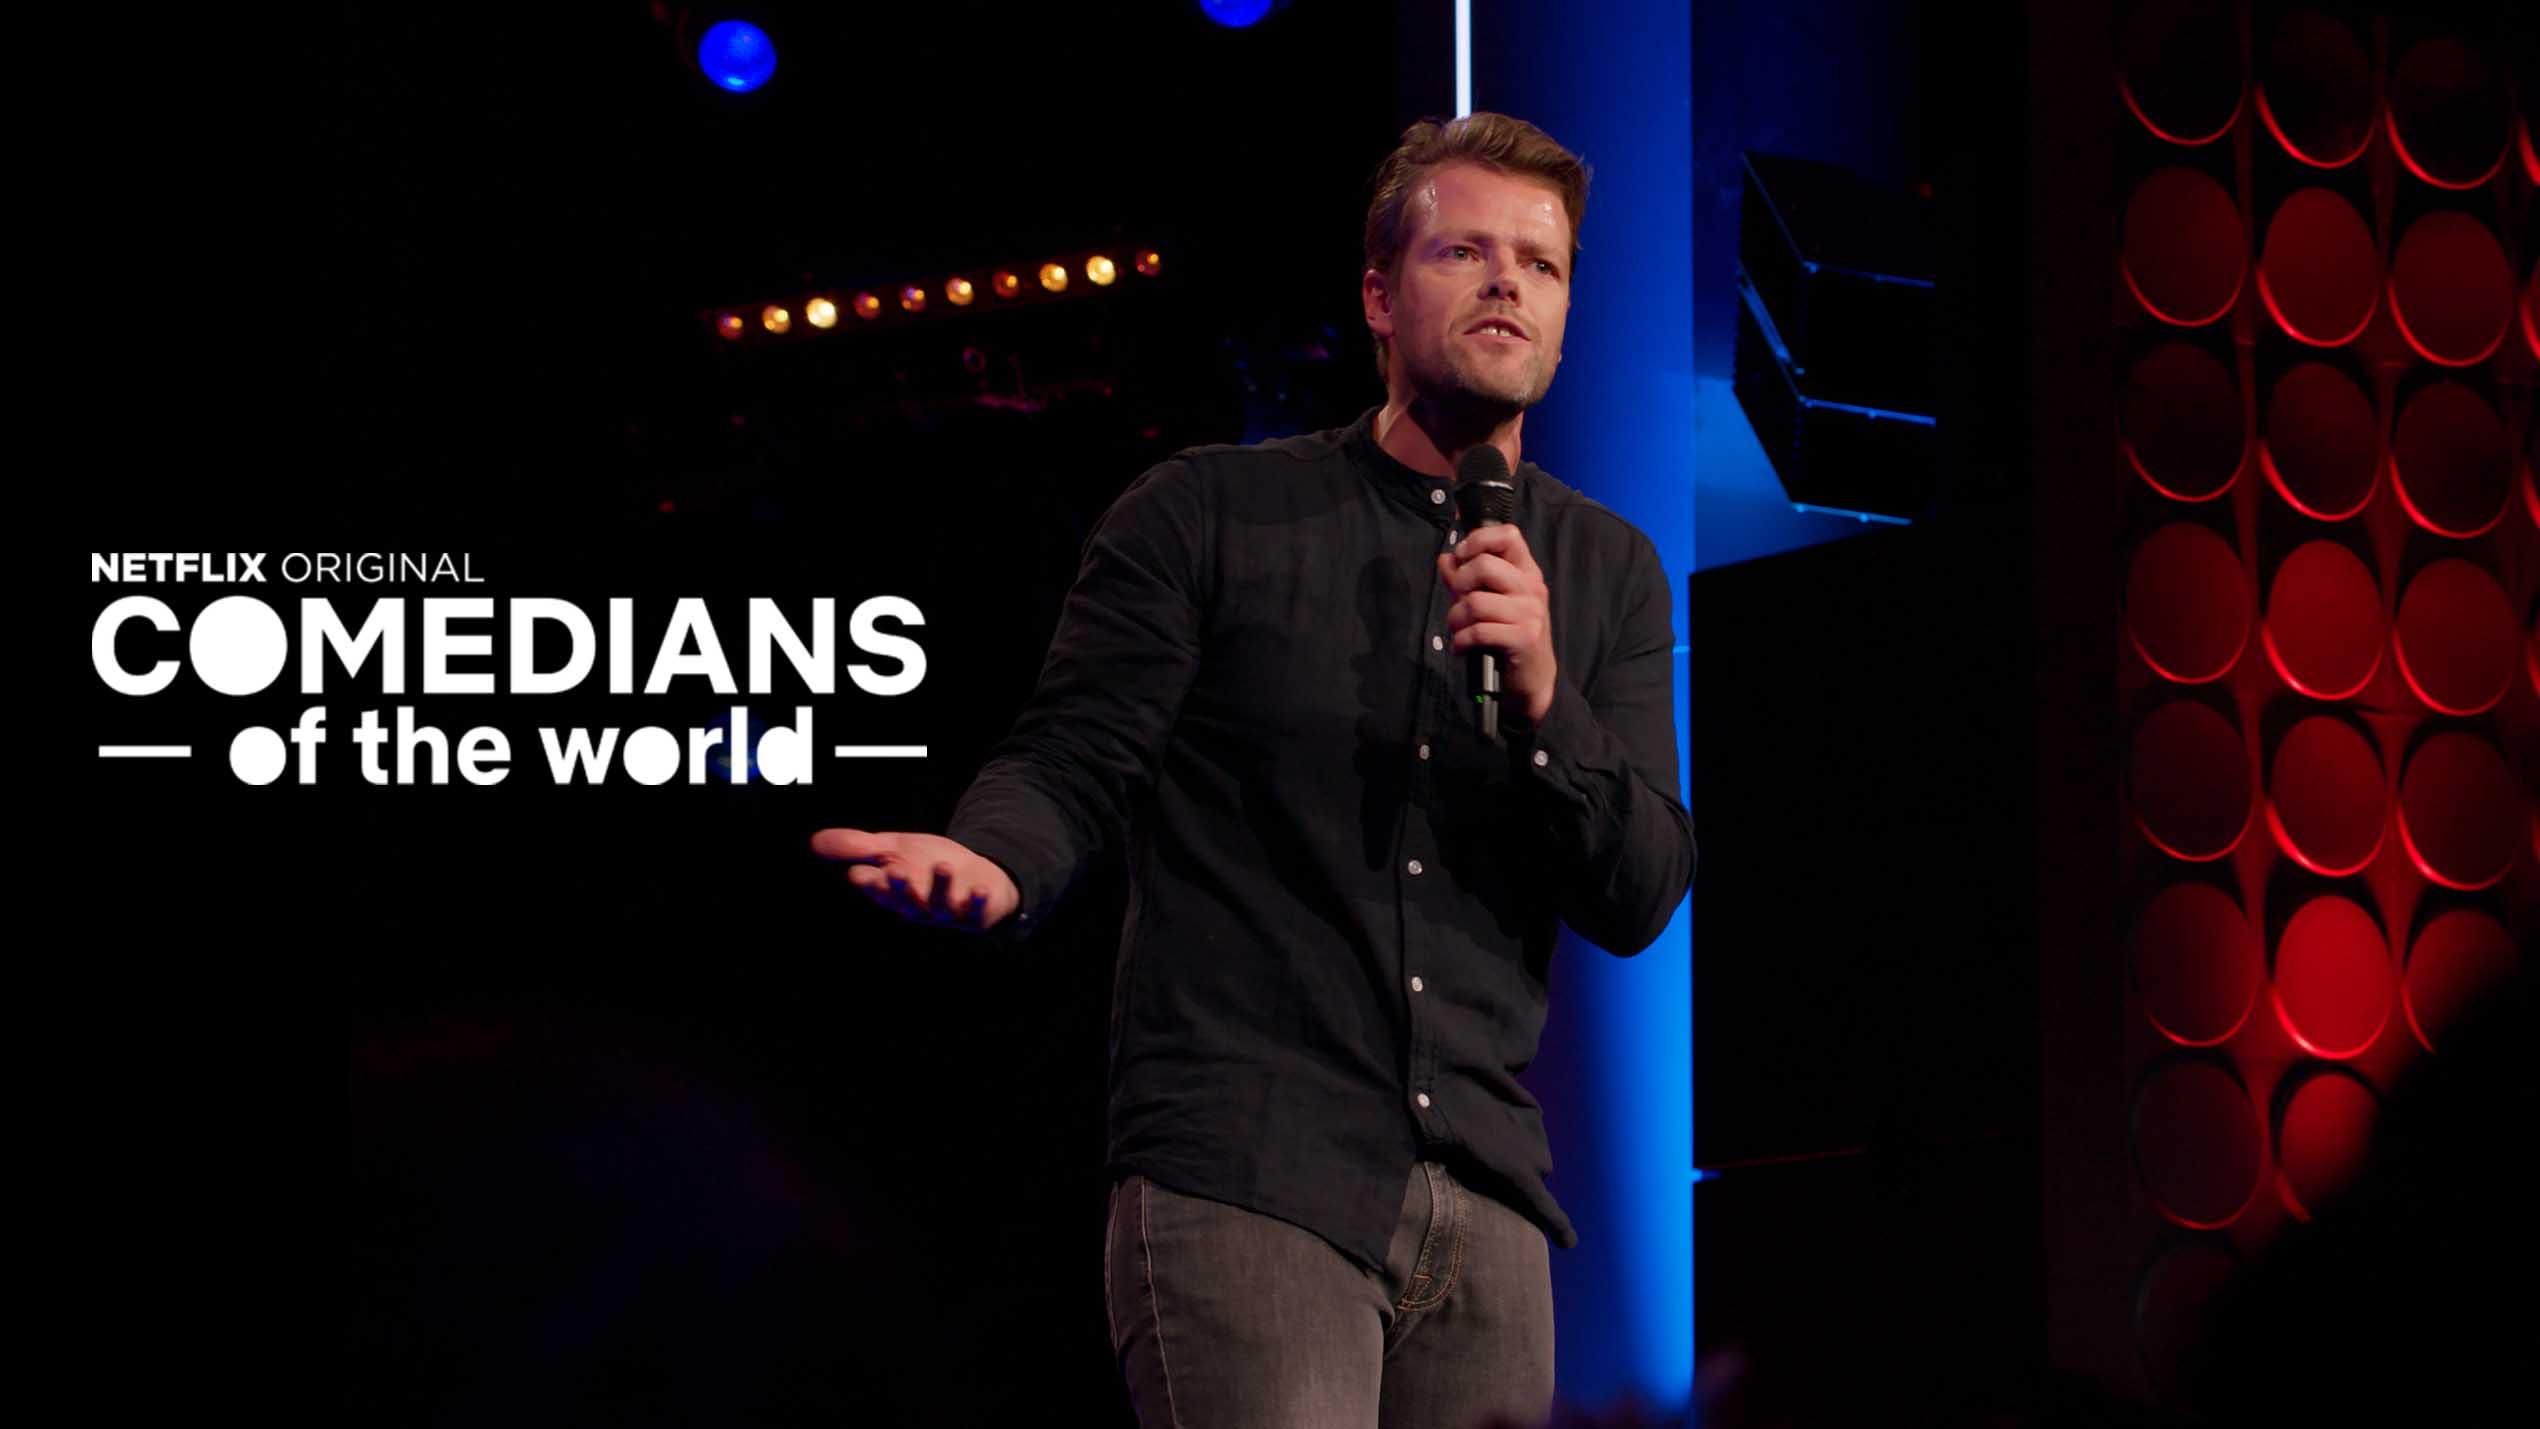 Netflix Original Comedians Of The World